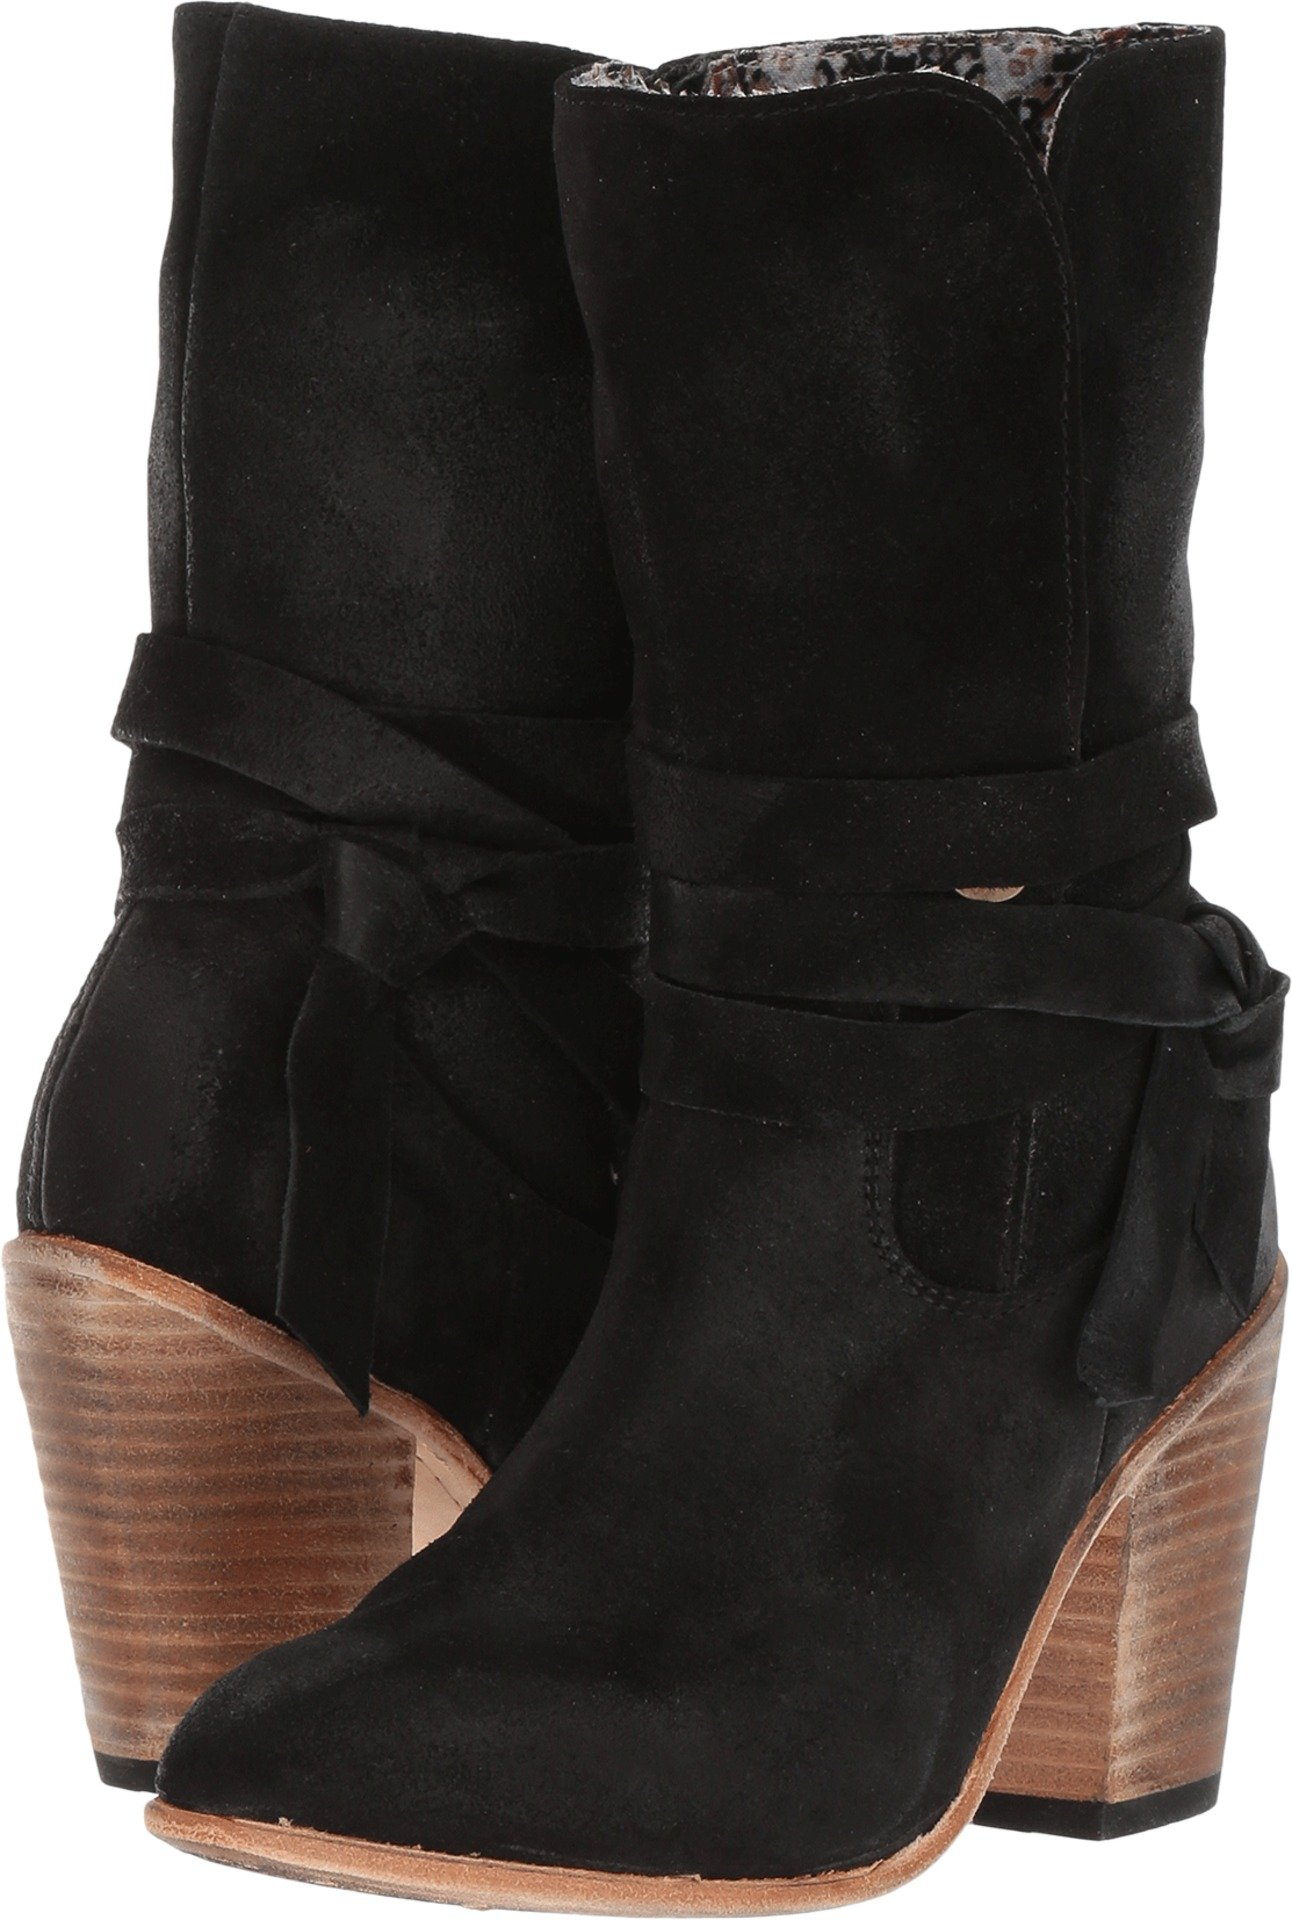 Freebird Women's Riot Western Boot, Black Suede, 7 B US